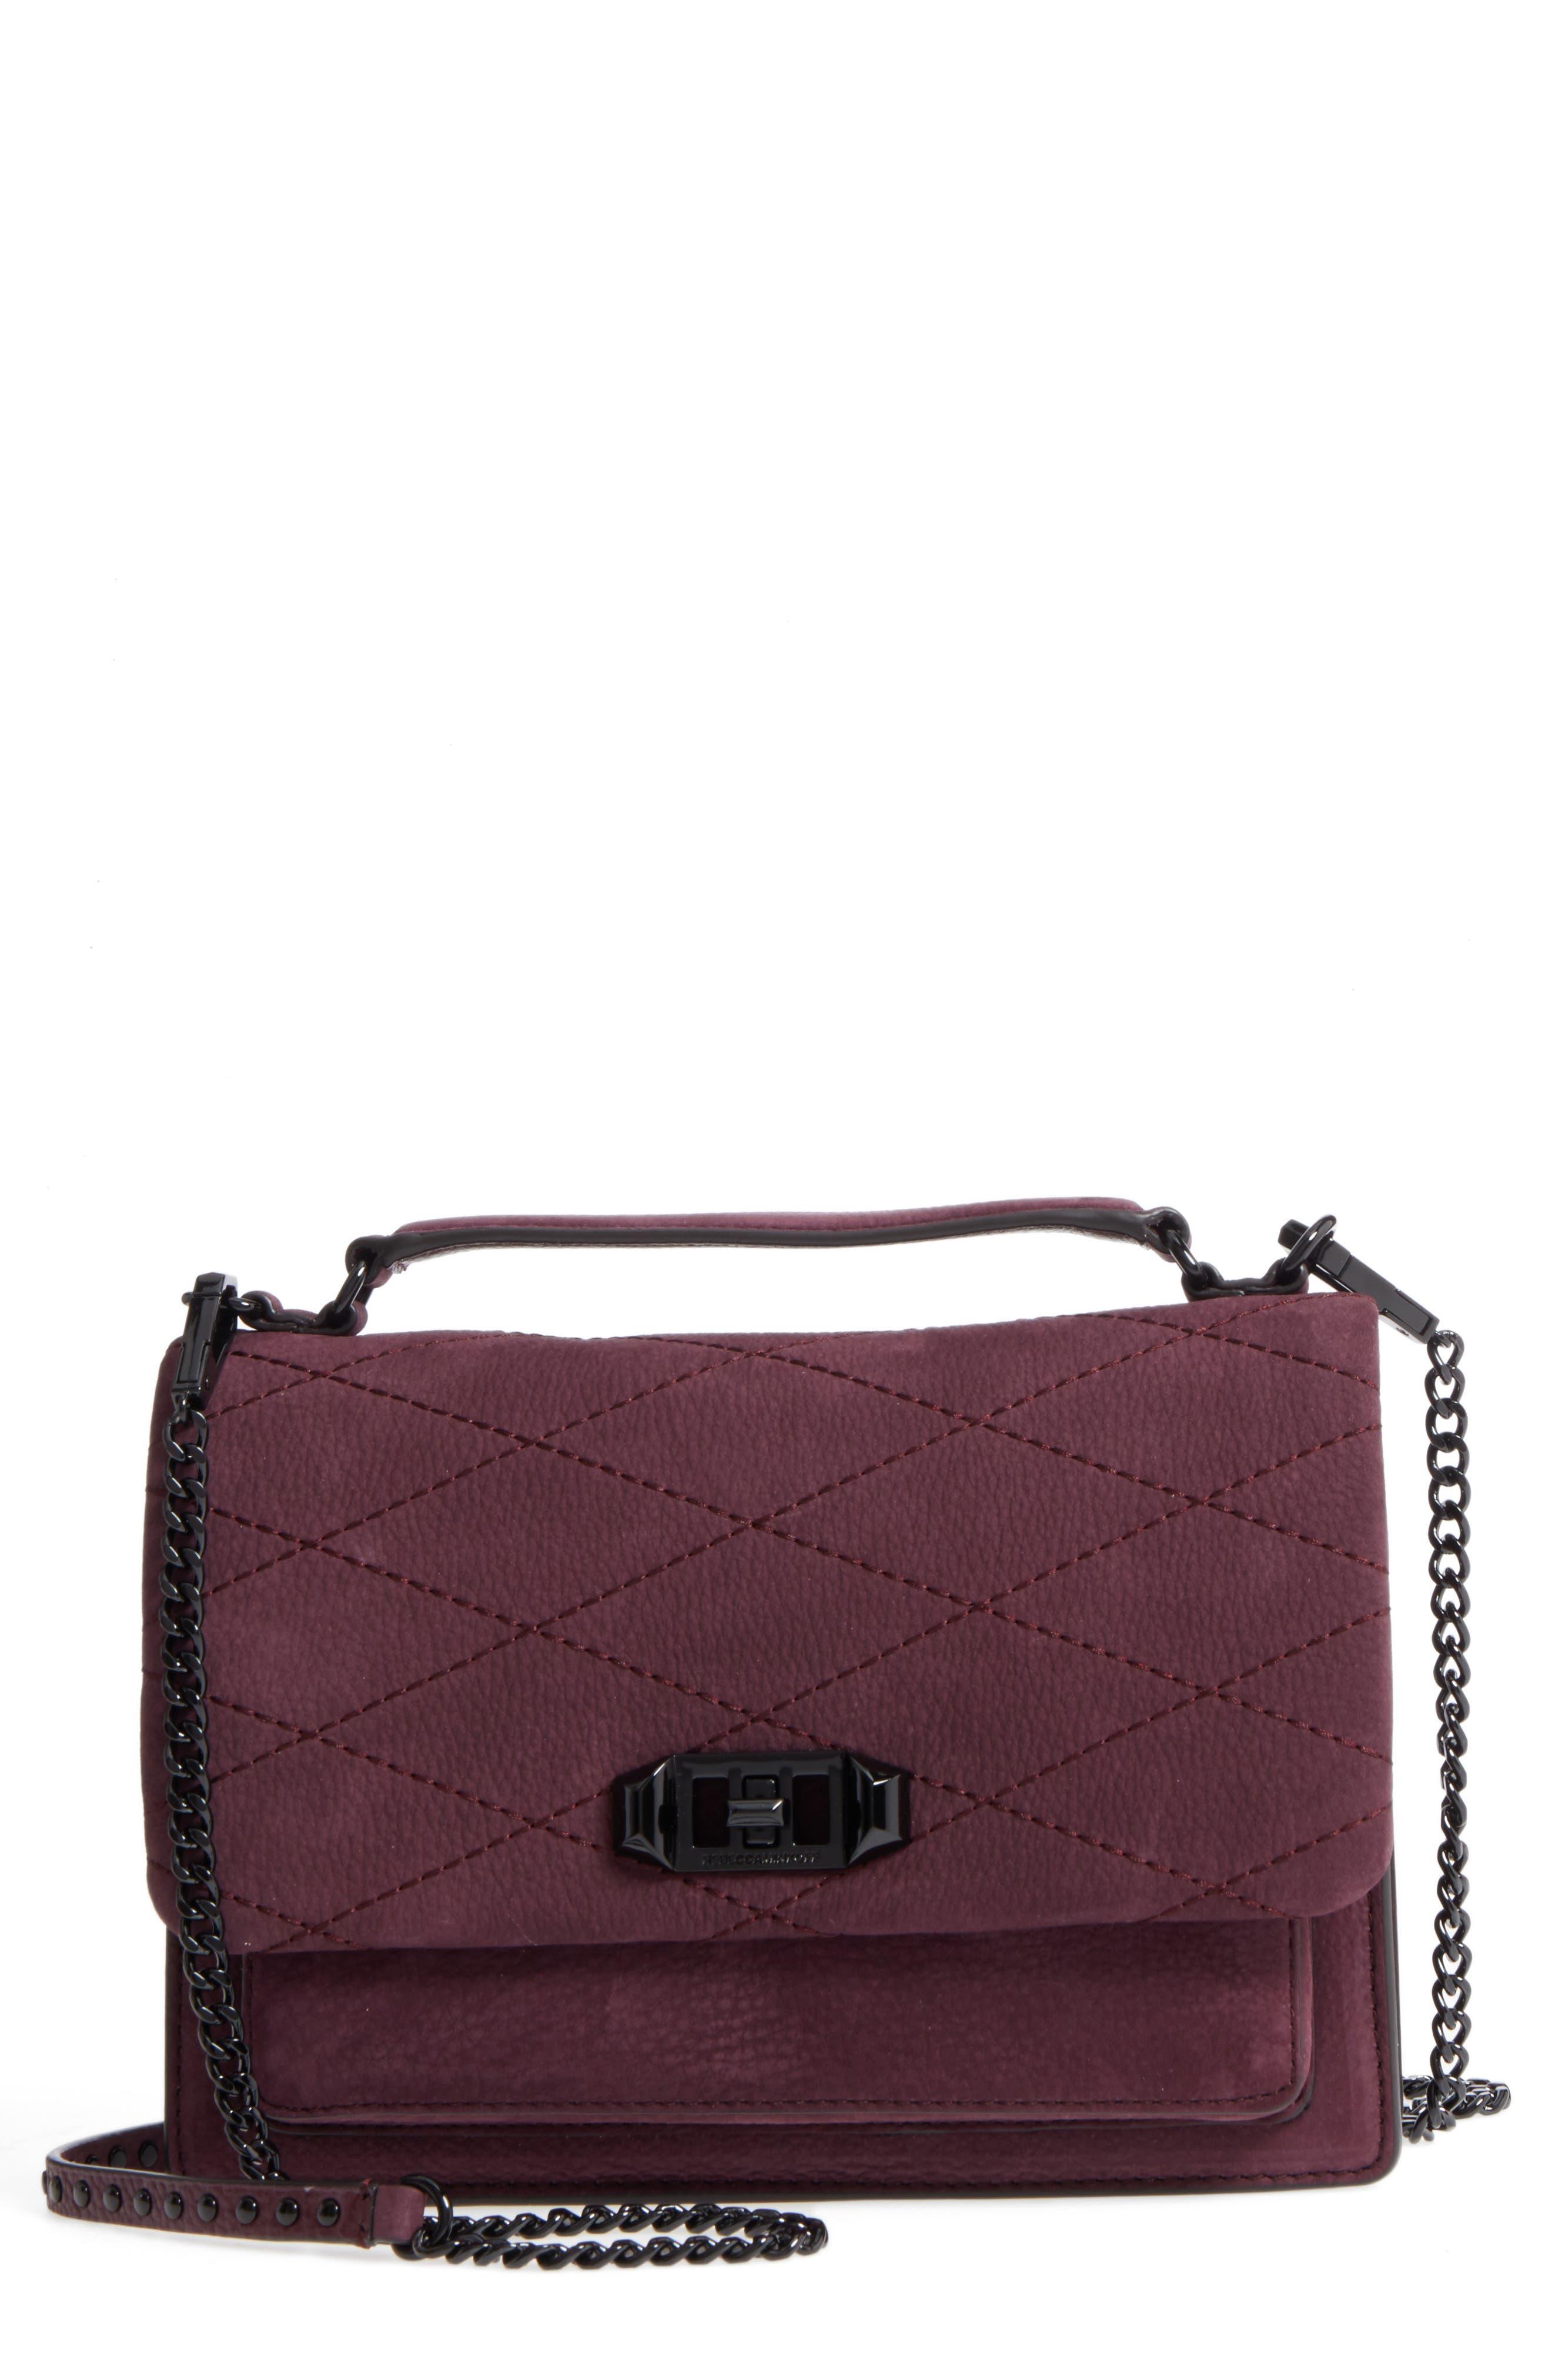 Medium Je T'aime Convertible Leather Crossbody Bag,                             Main thumbnail 6, color,